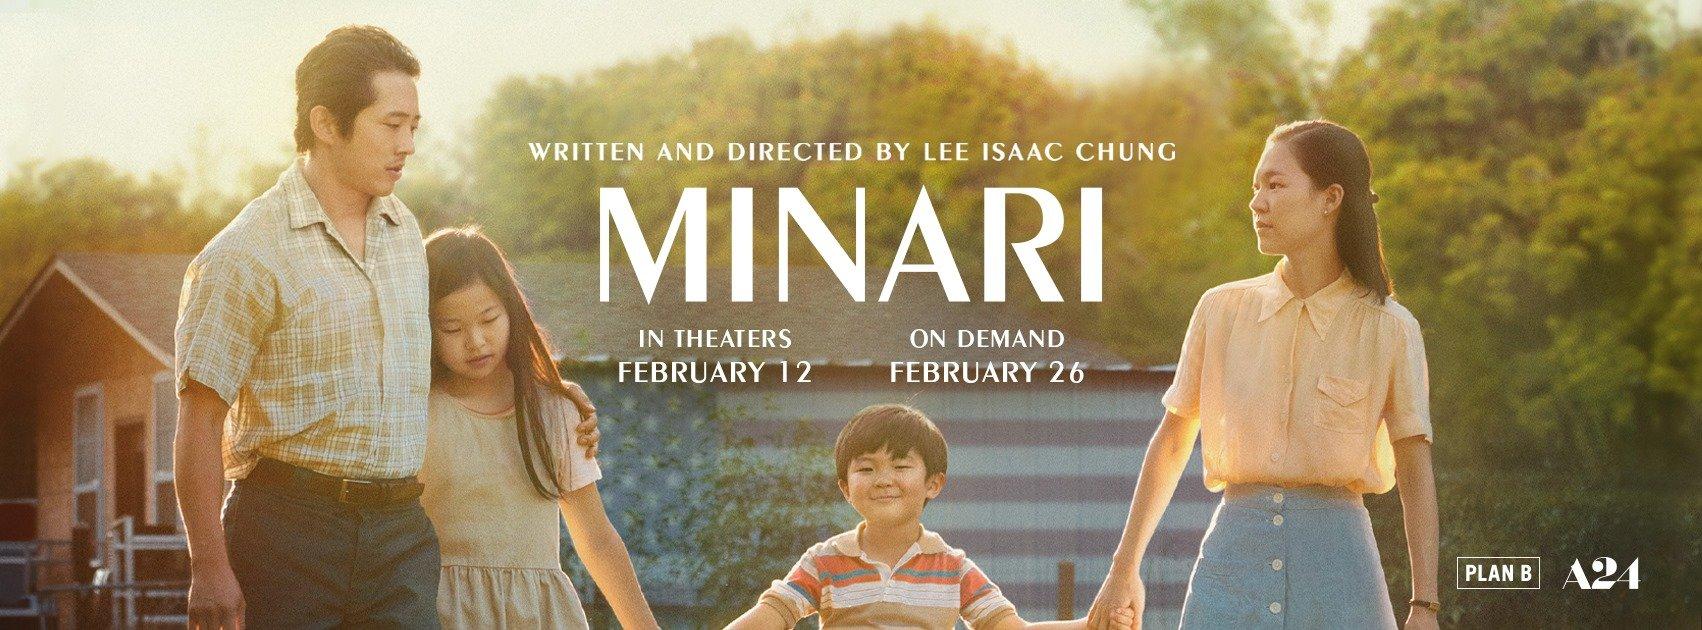 Movie 'Minari'